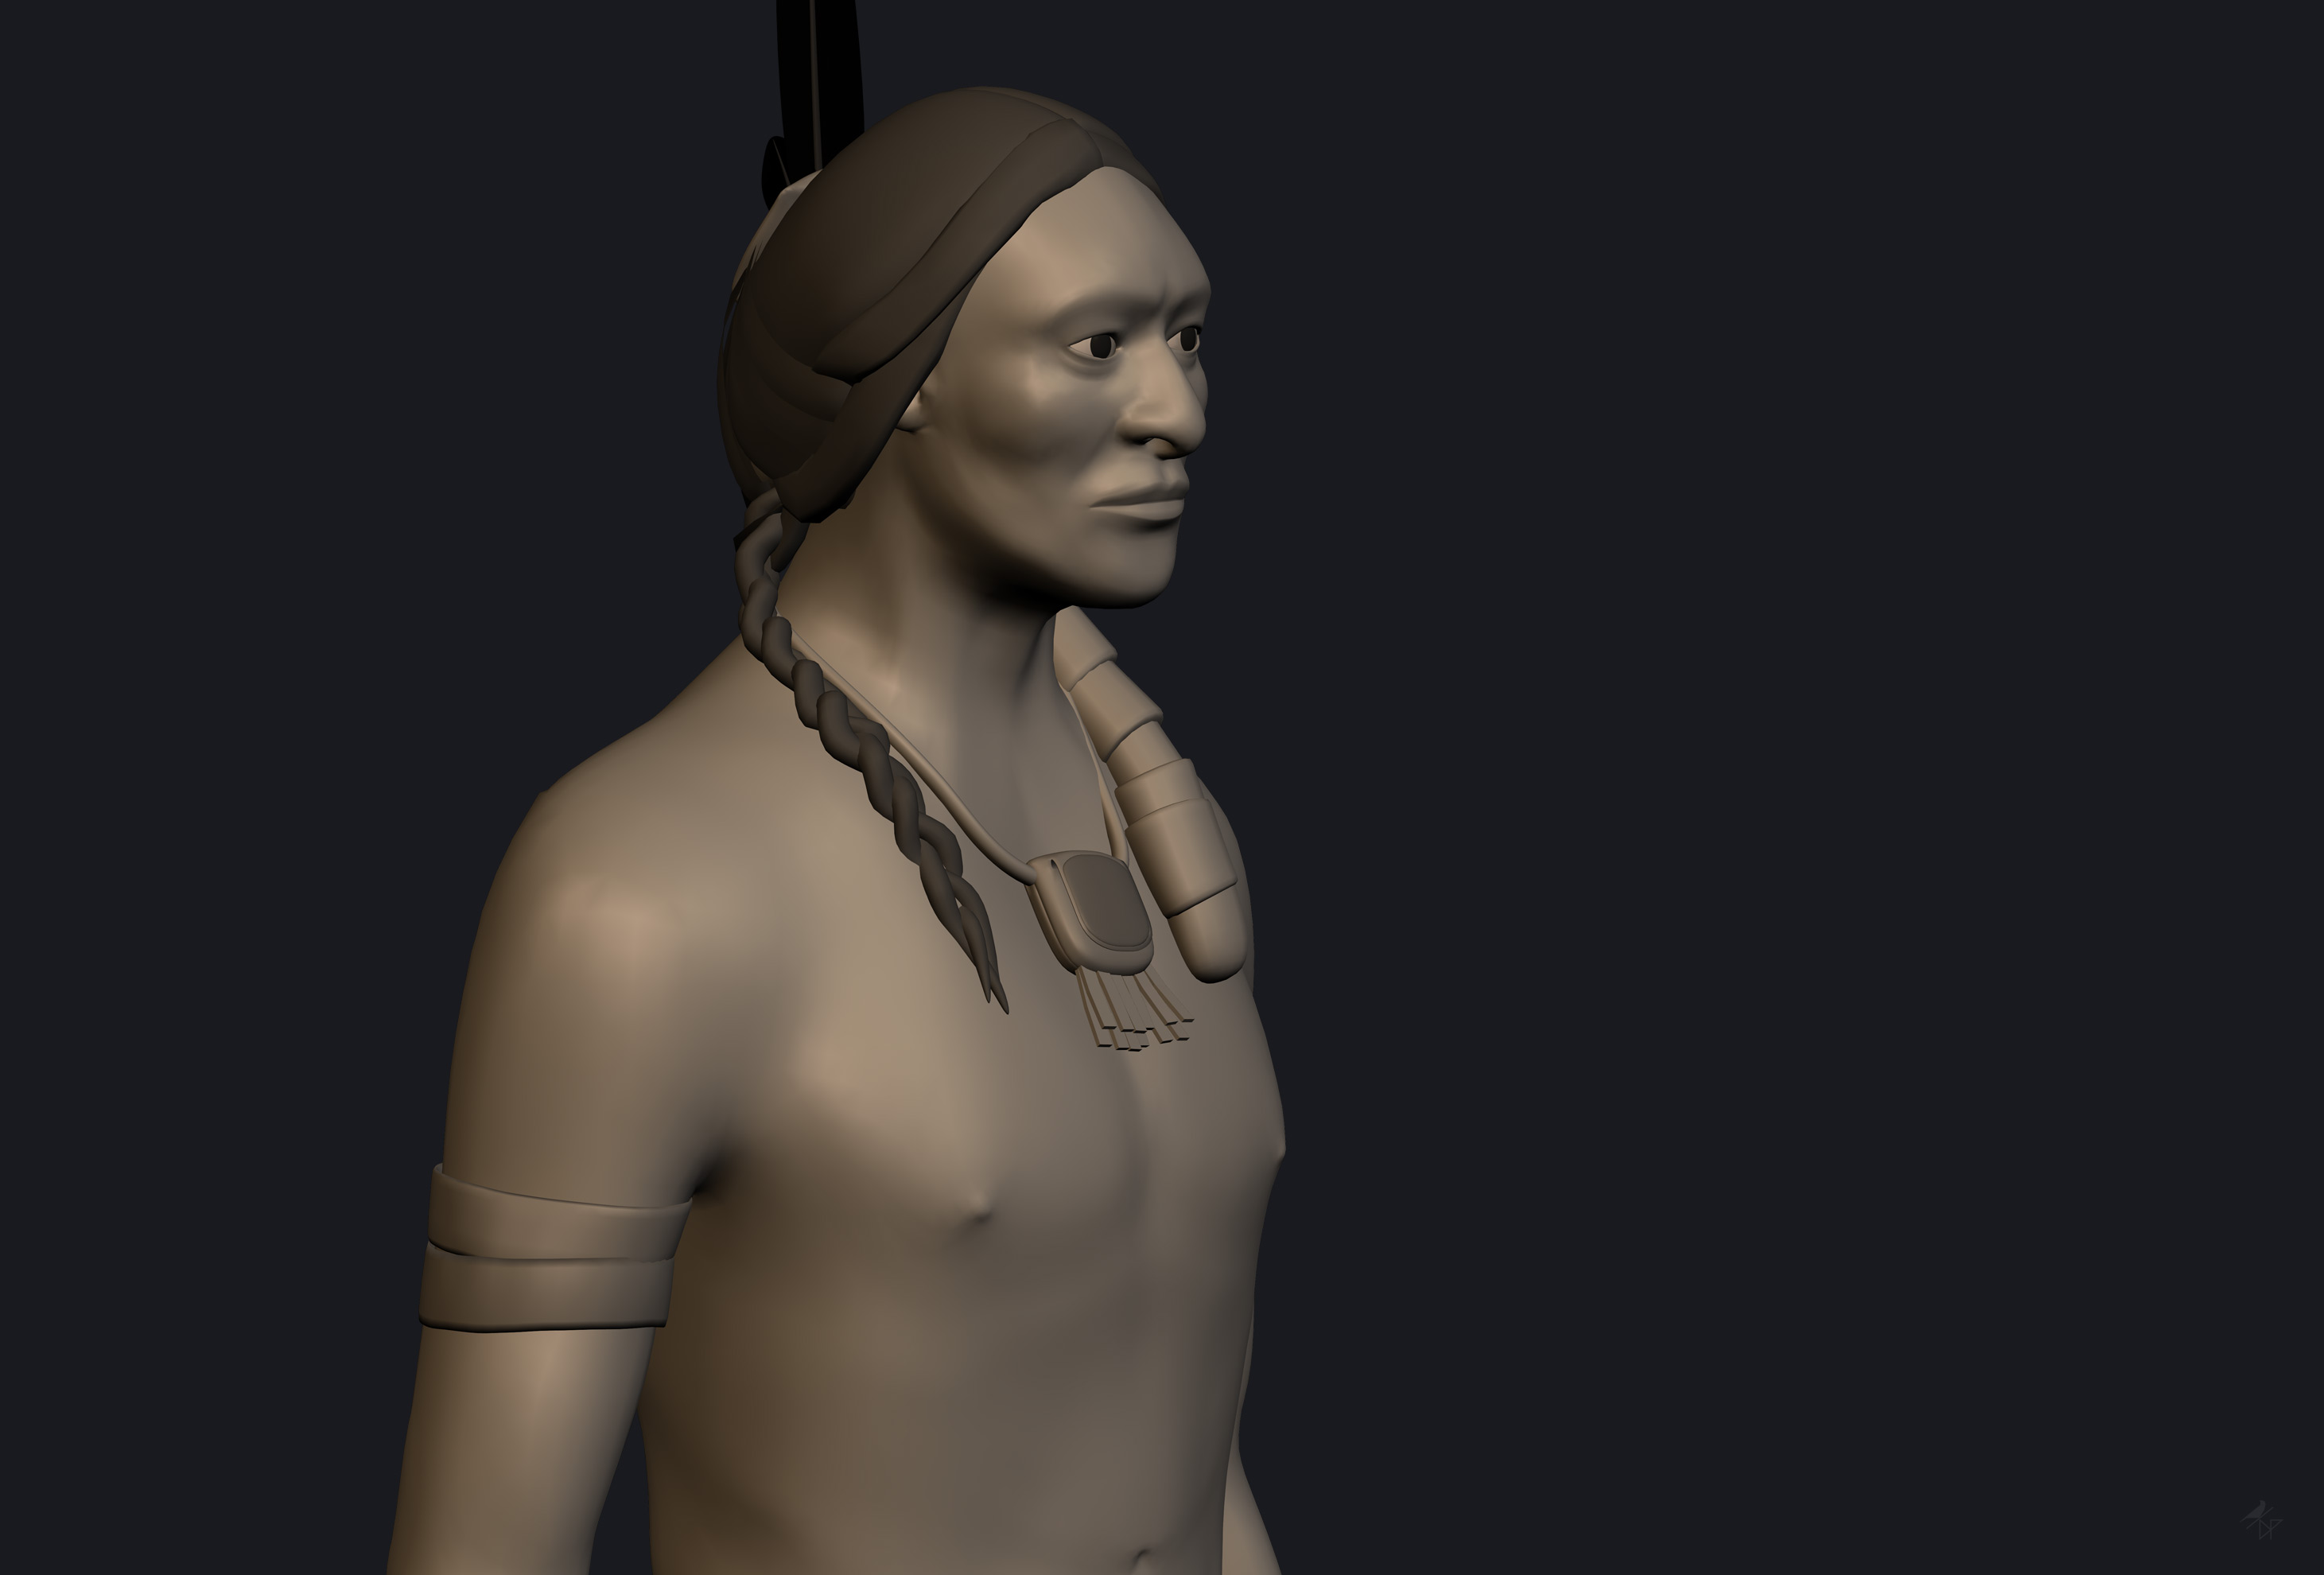 3D, character, indien, damien, pons, strasbourg, alsace, grand est